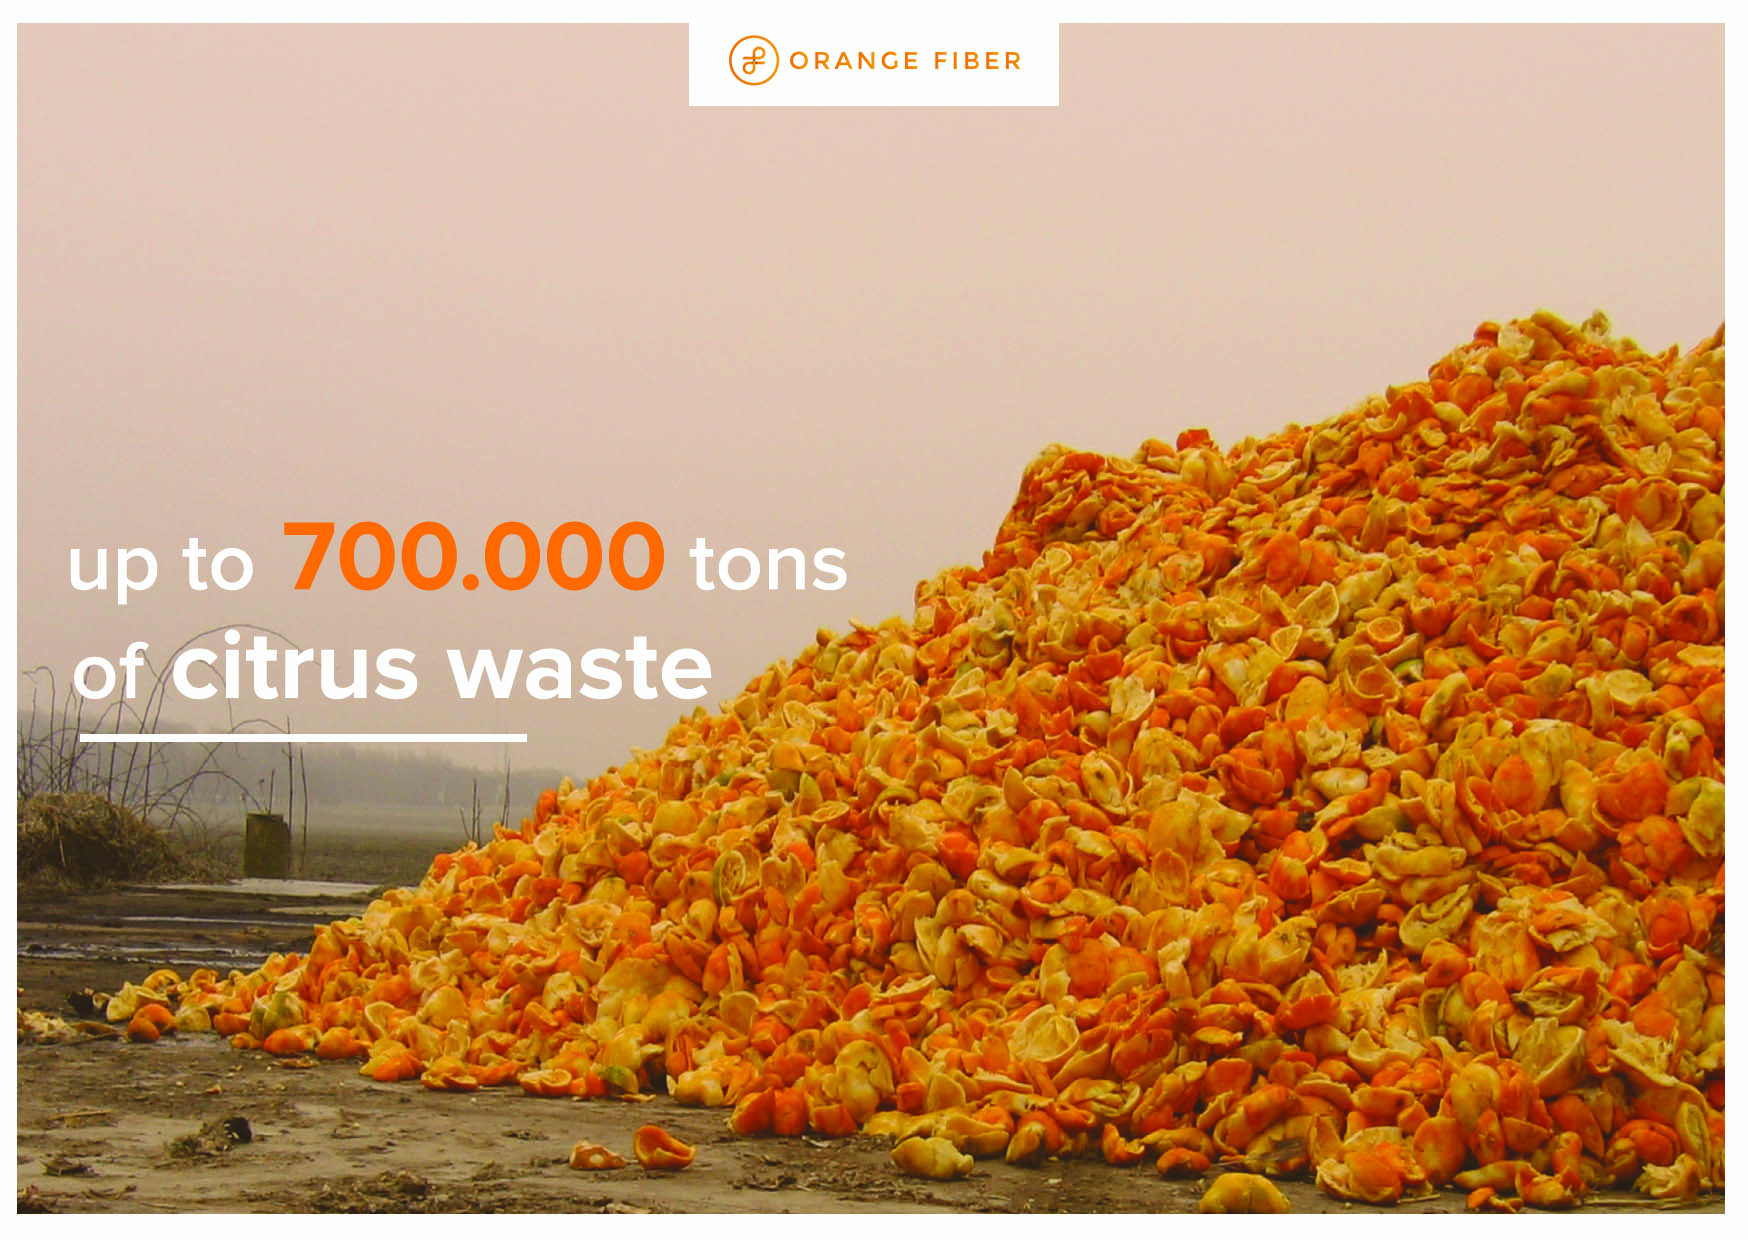 photo credit: orange fiber